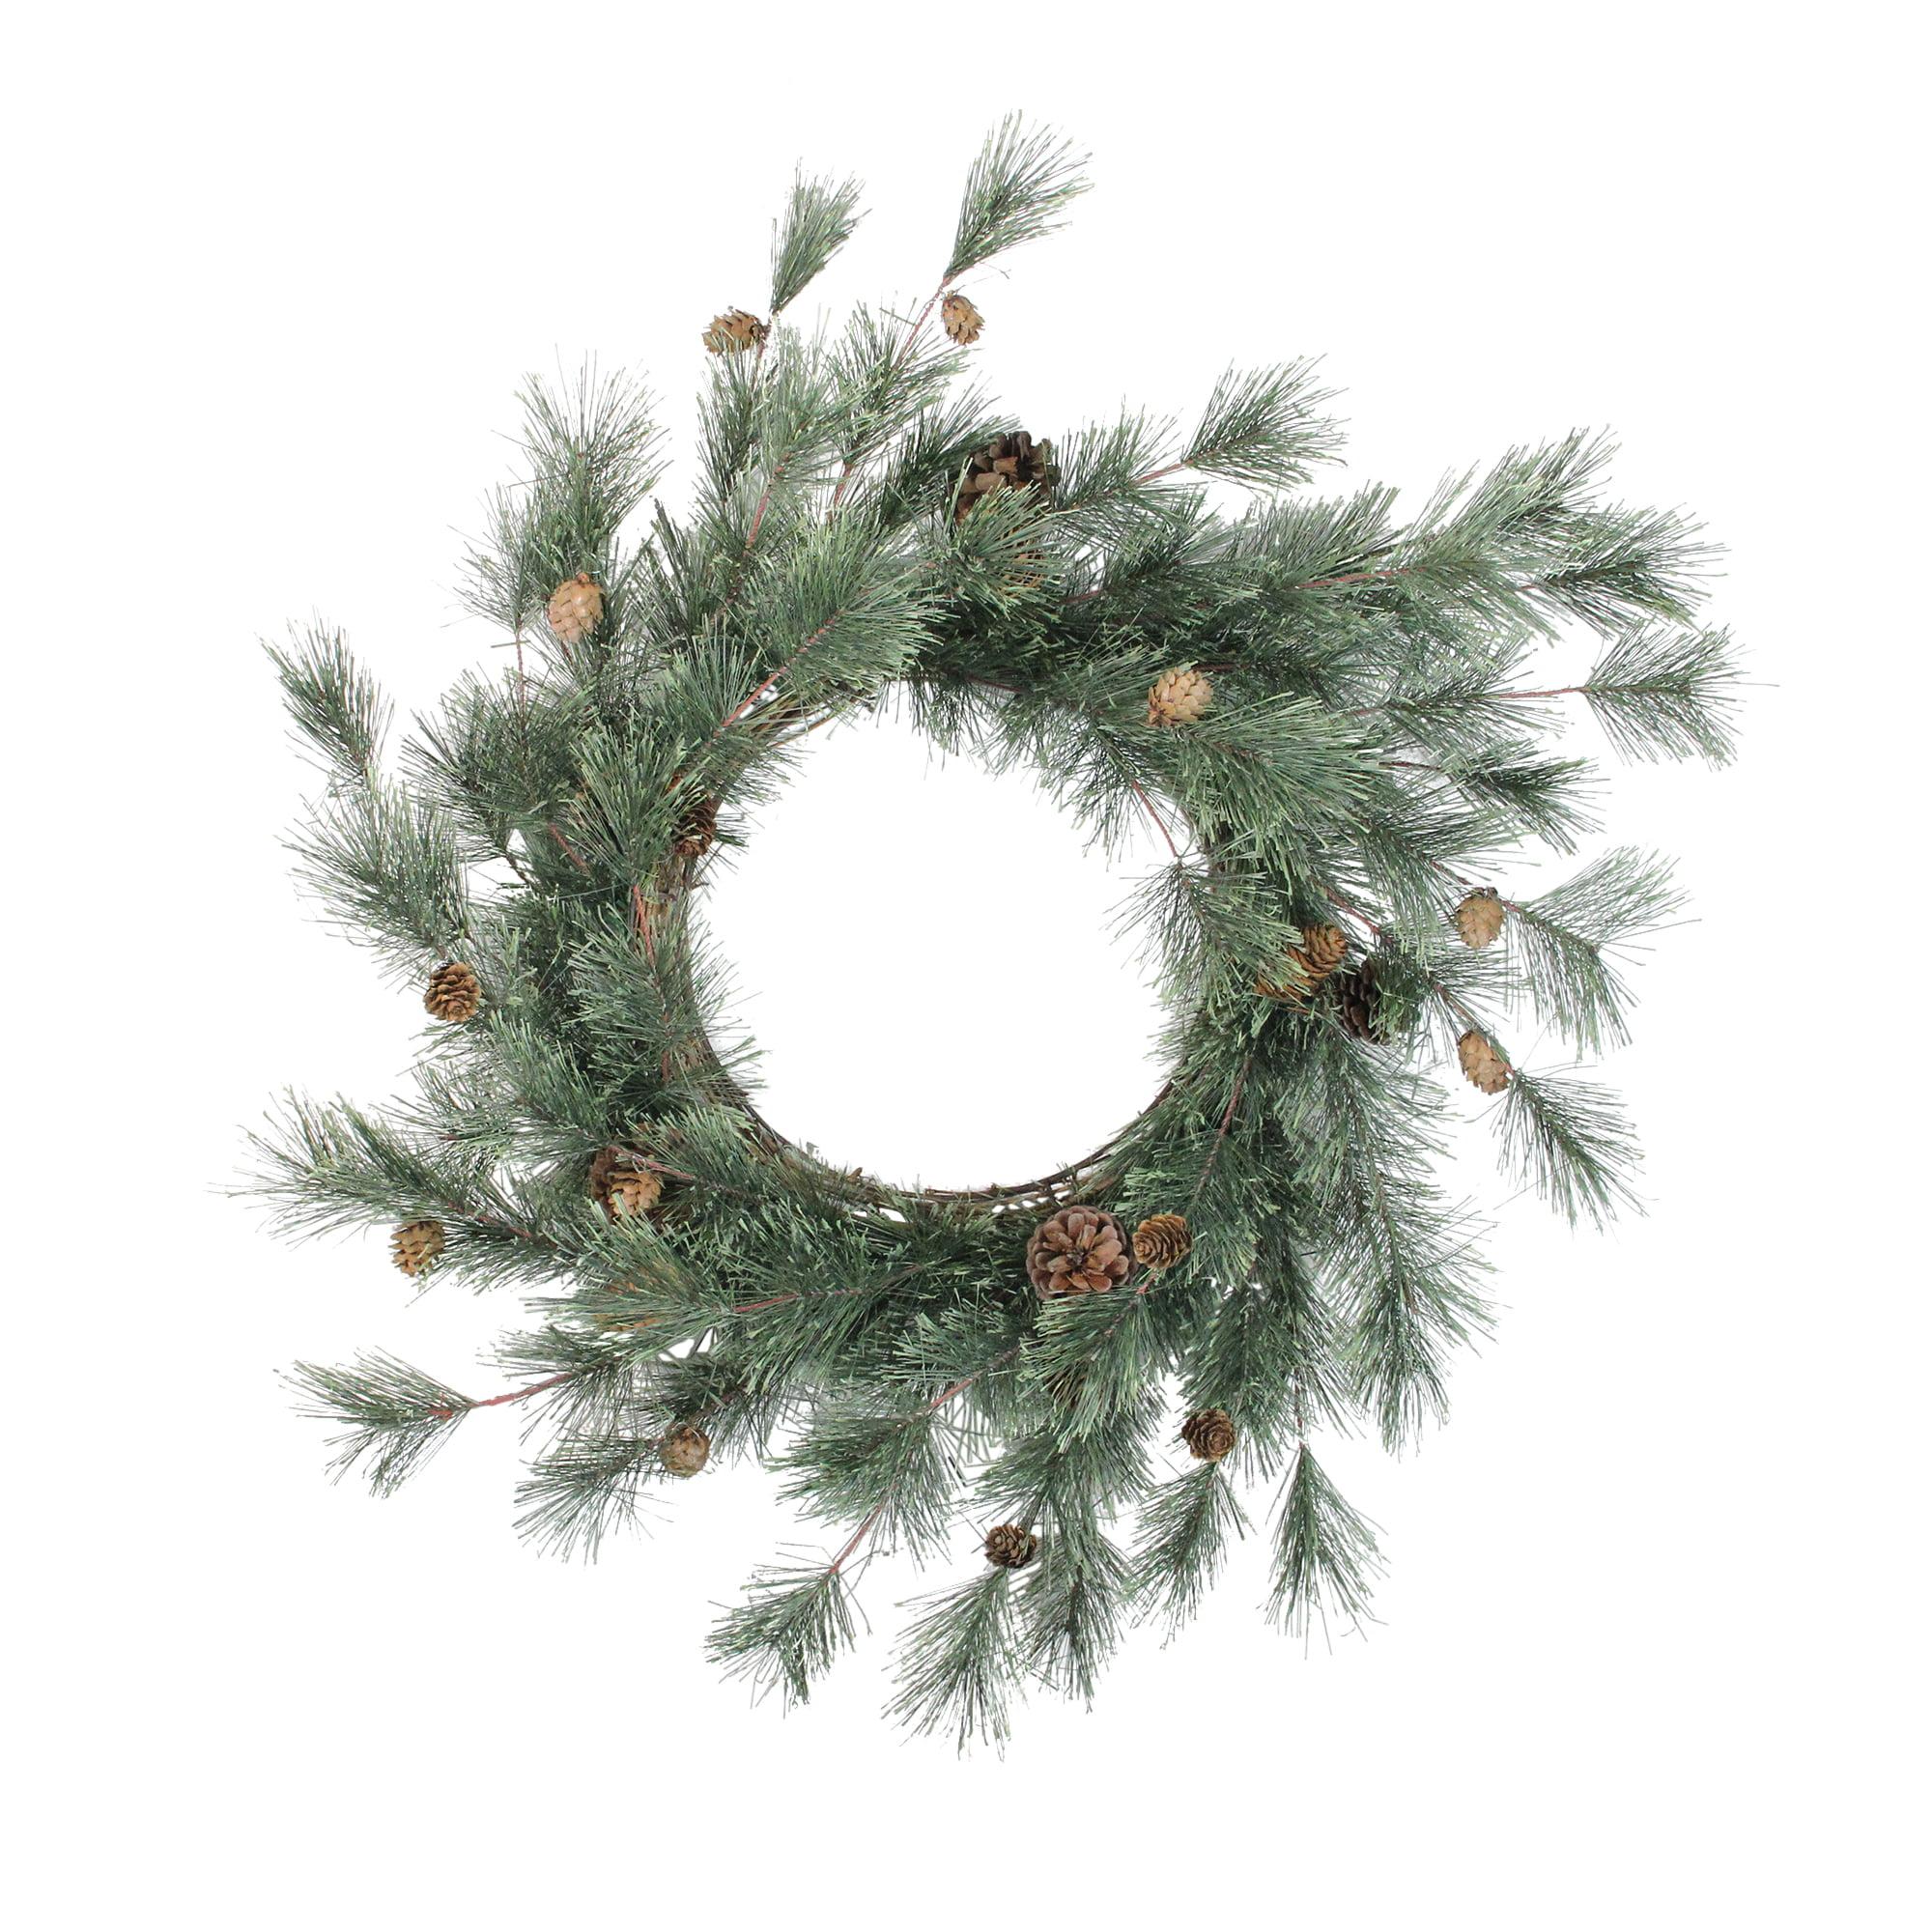 Mixed Pine Cones Artificial Christmas Wreath 26 Inch Unlit Walmart Com Walmart Com